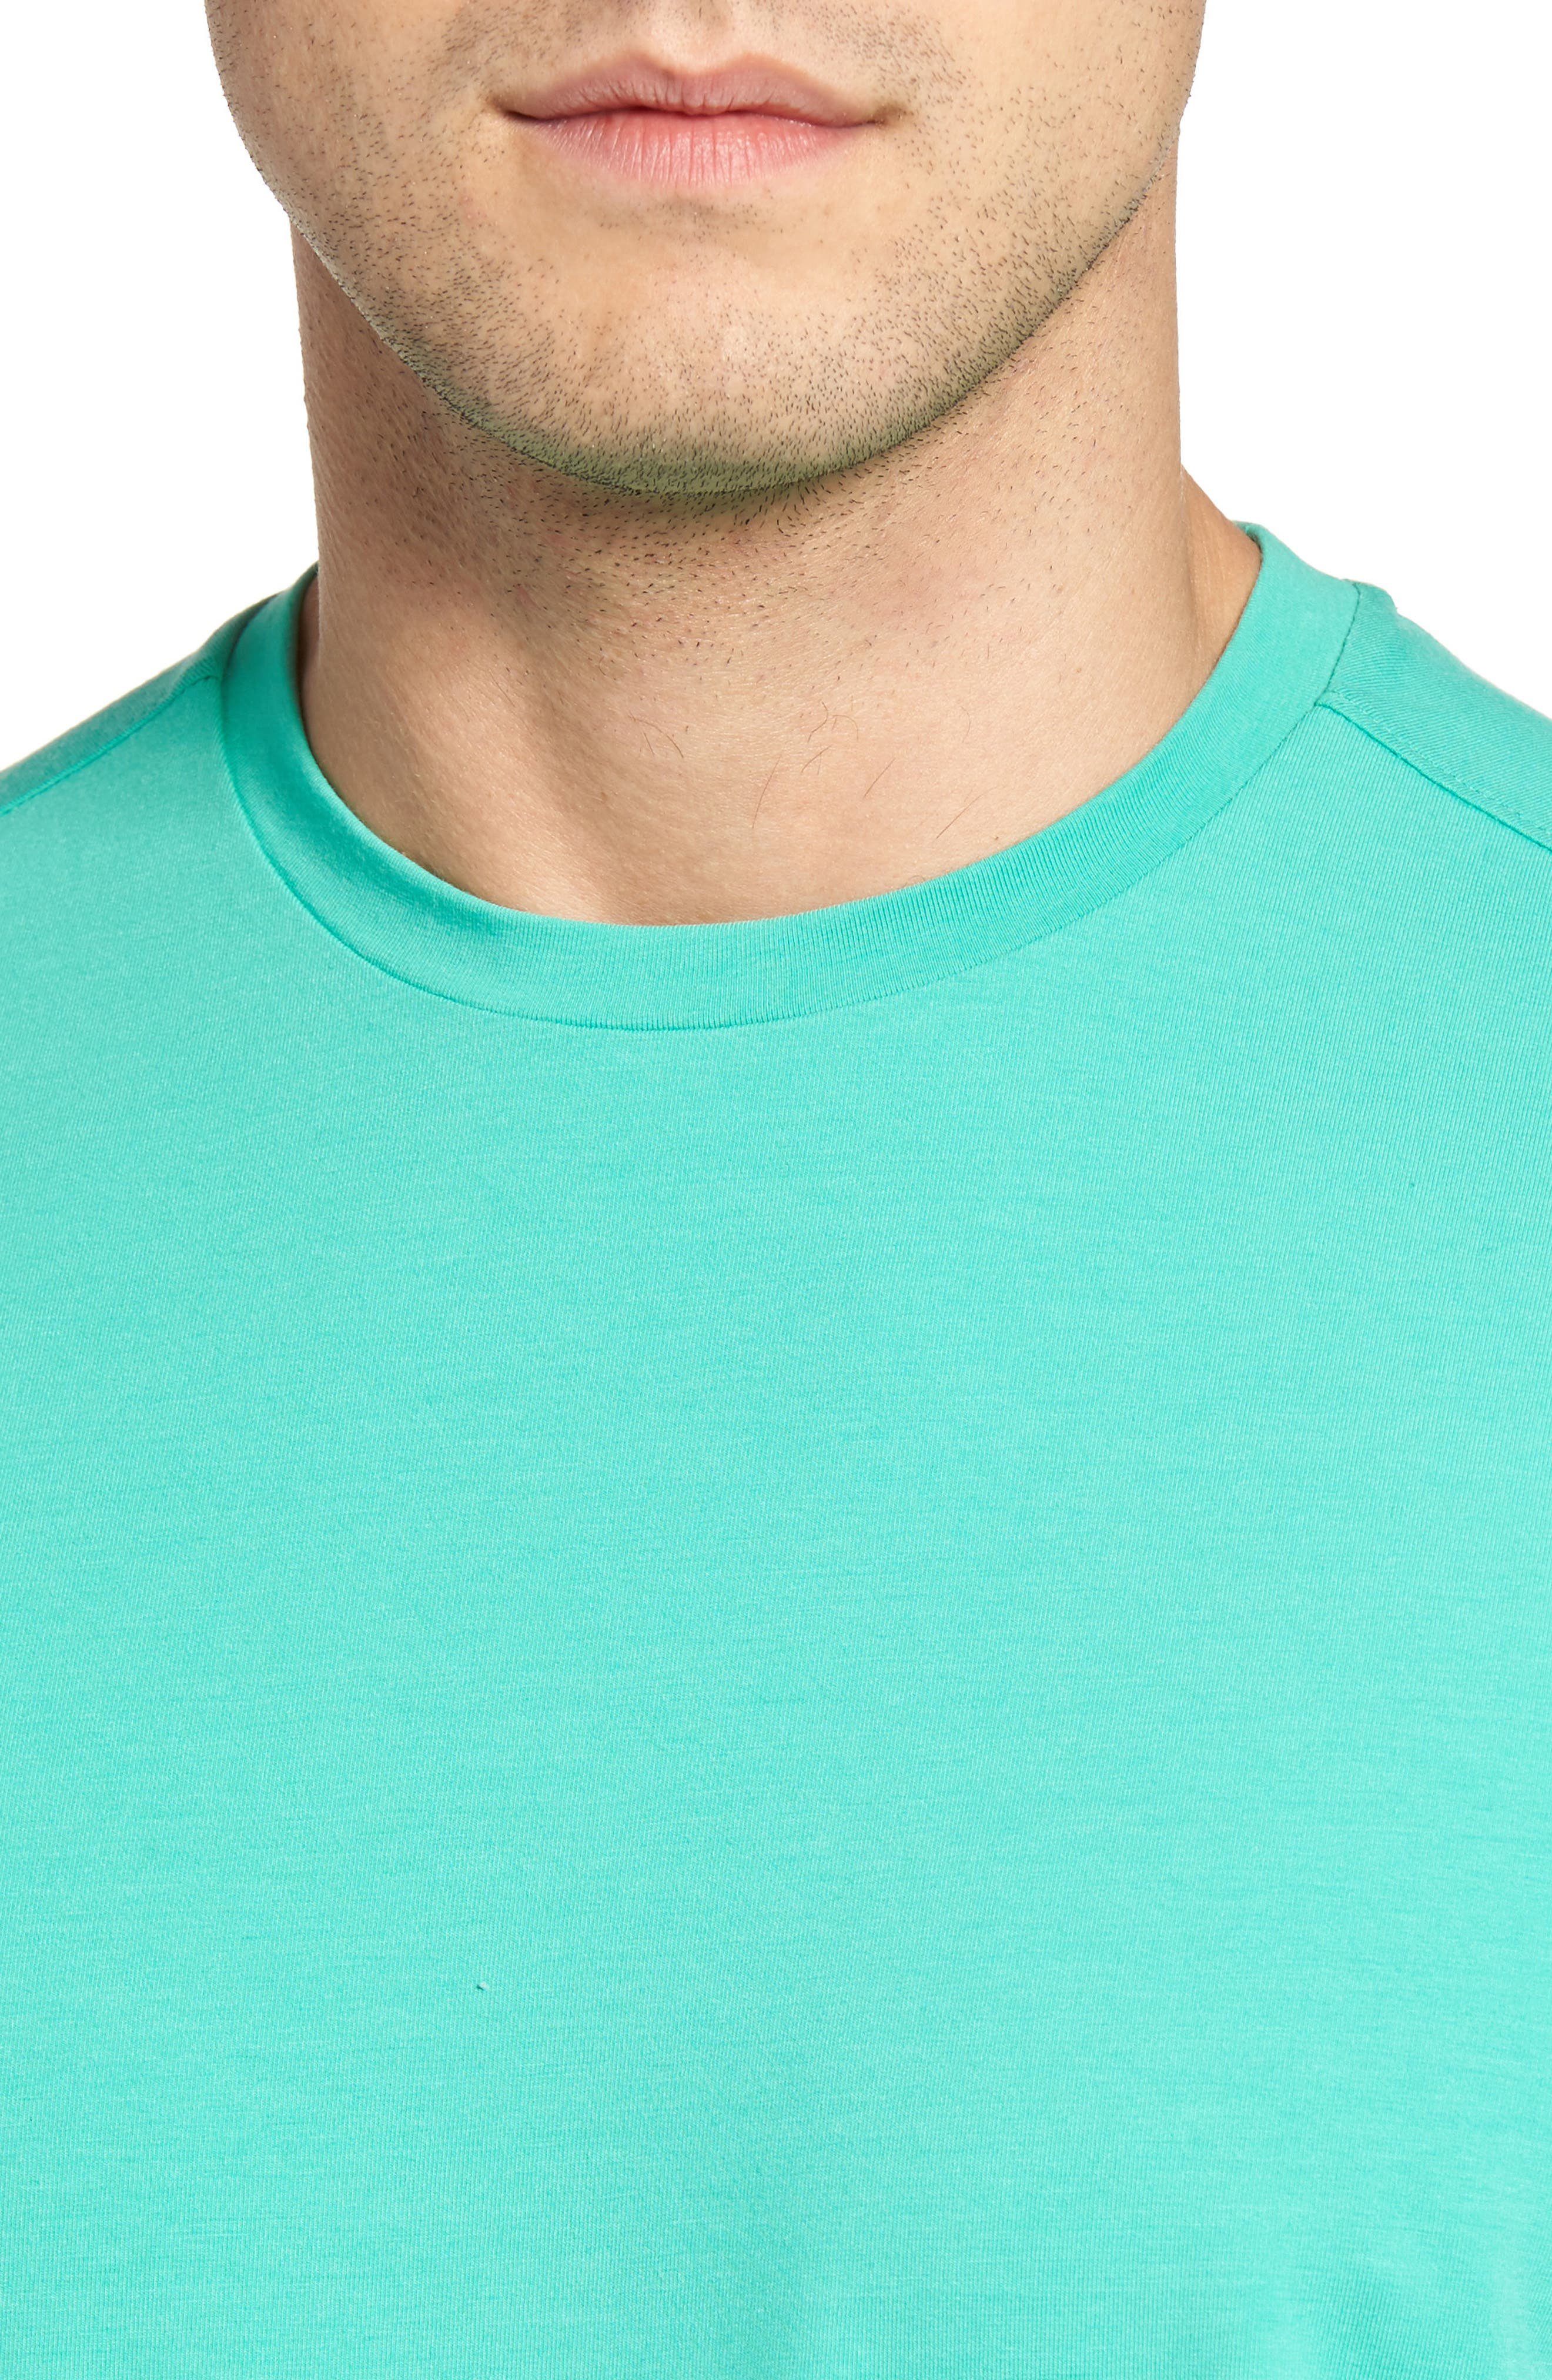 Tropicool T-Shirt,                             Alternate thumbnail 35, color,